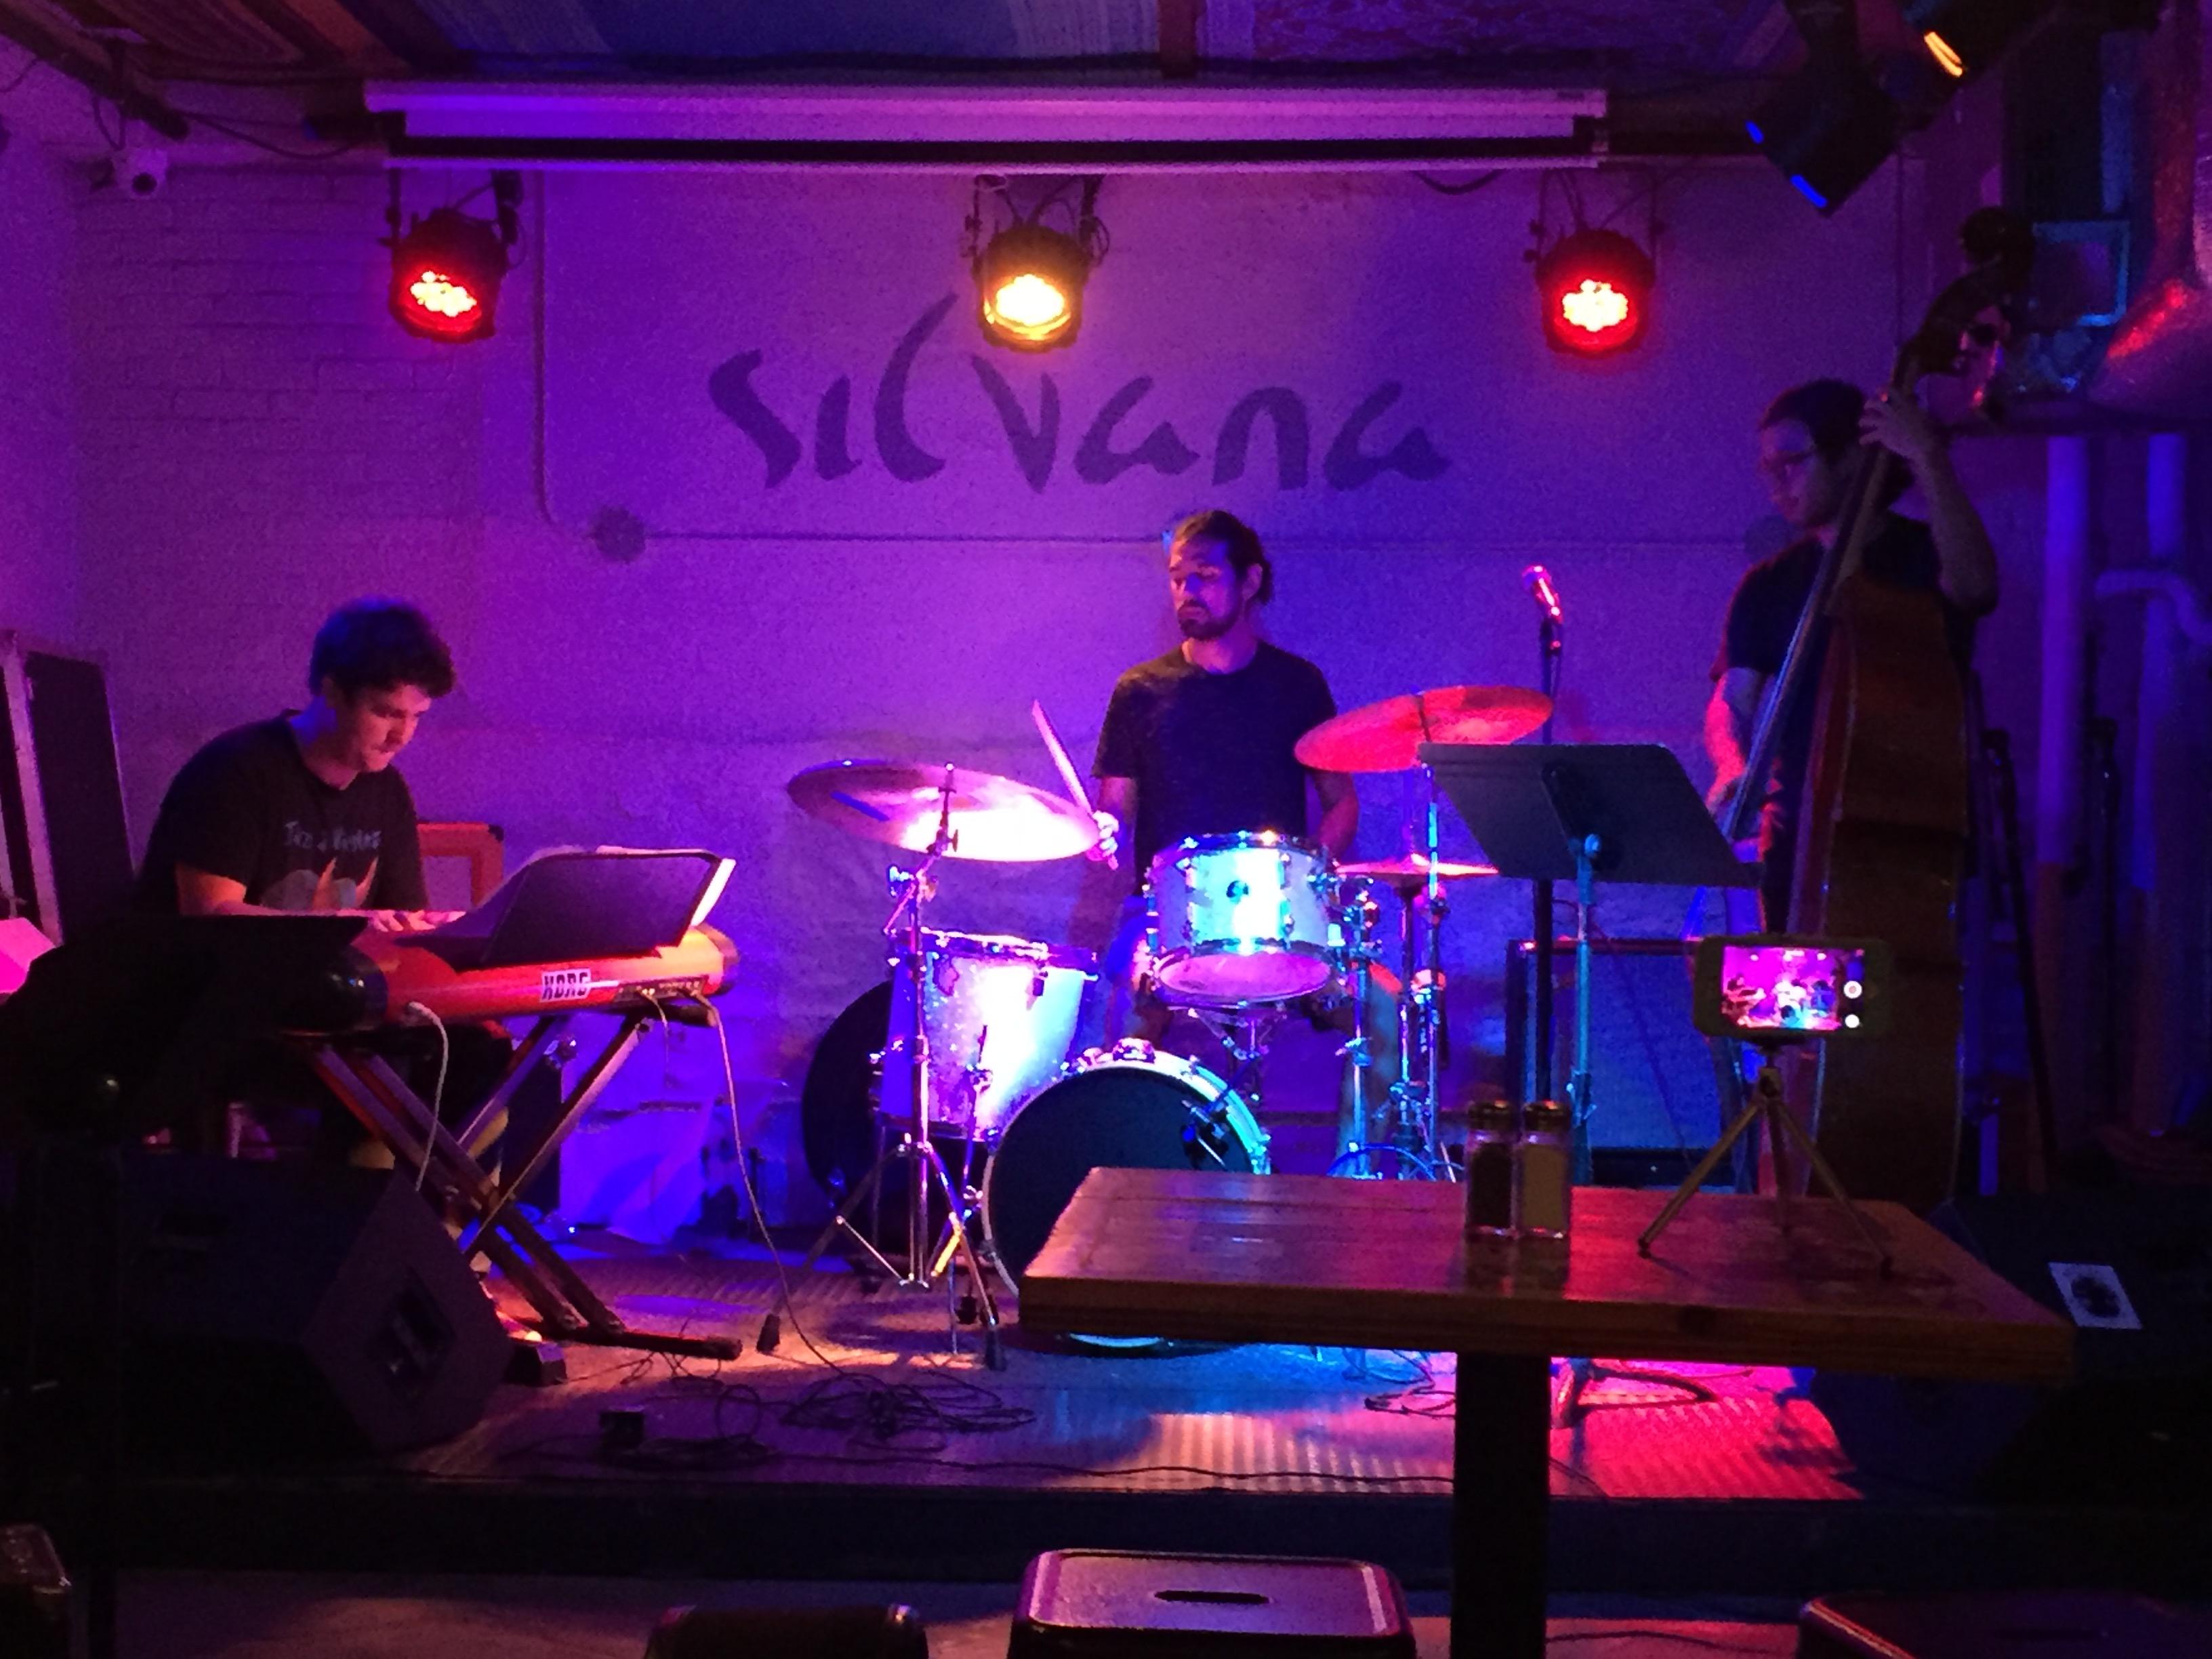 Experimental Trio at Silvana